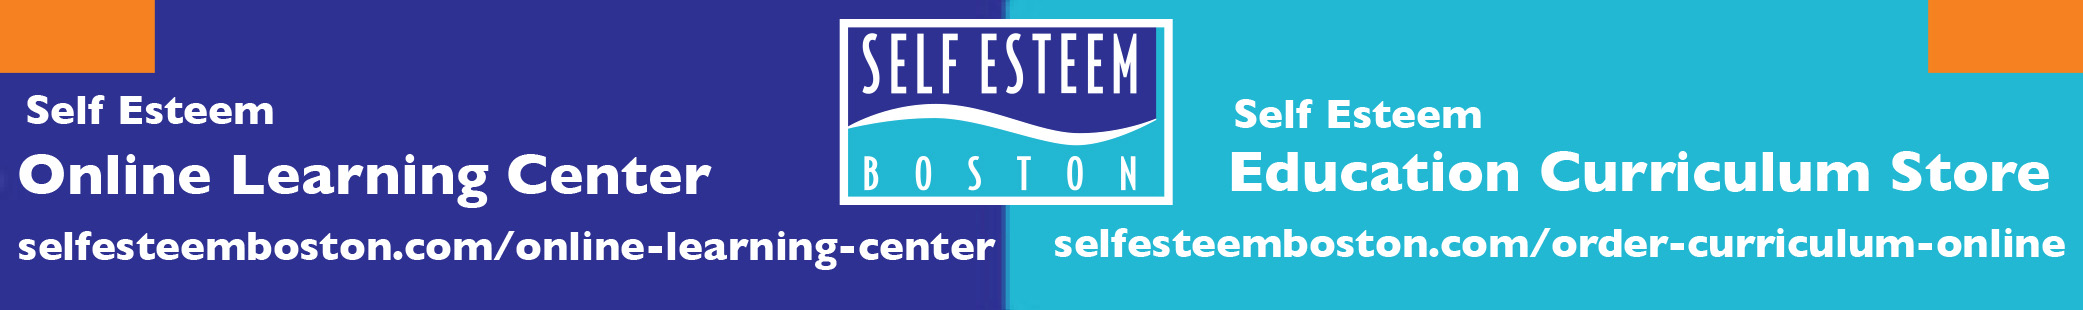 Self Esteem ad